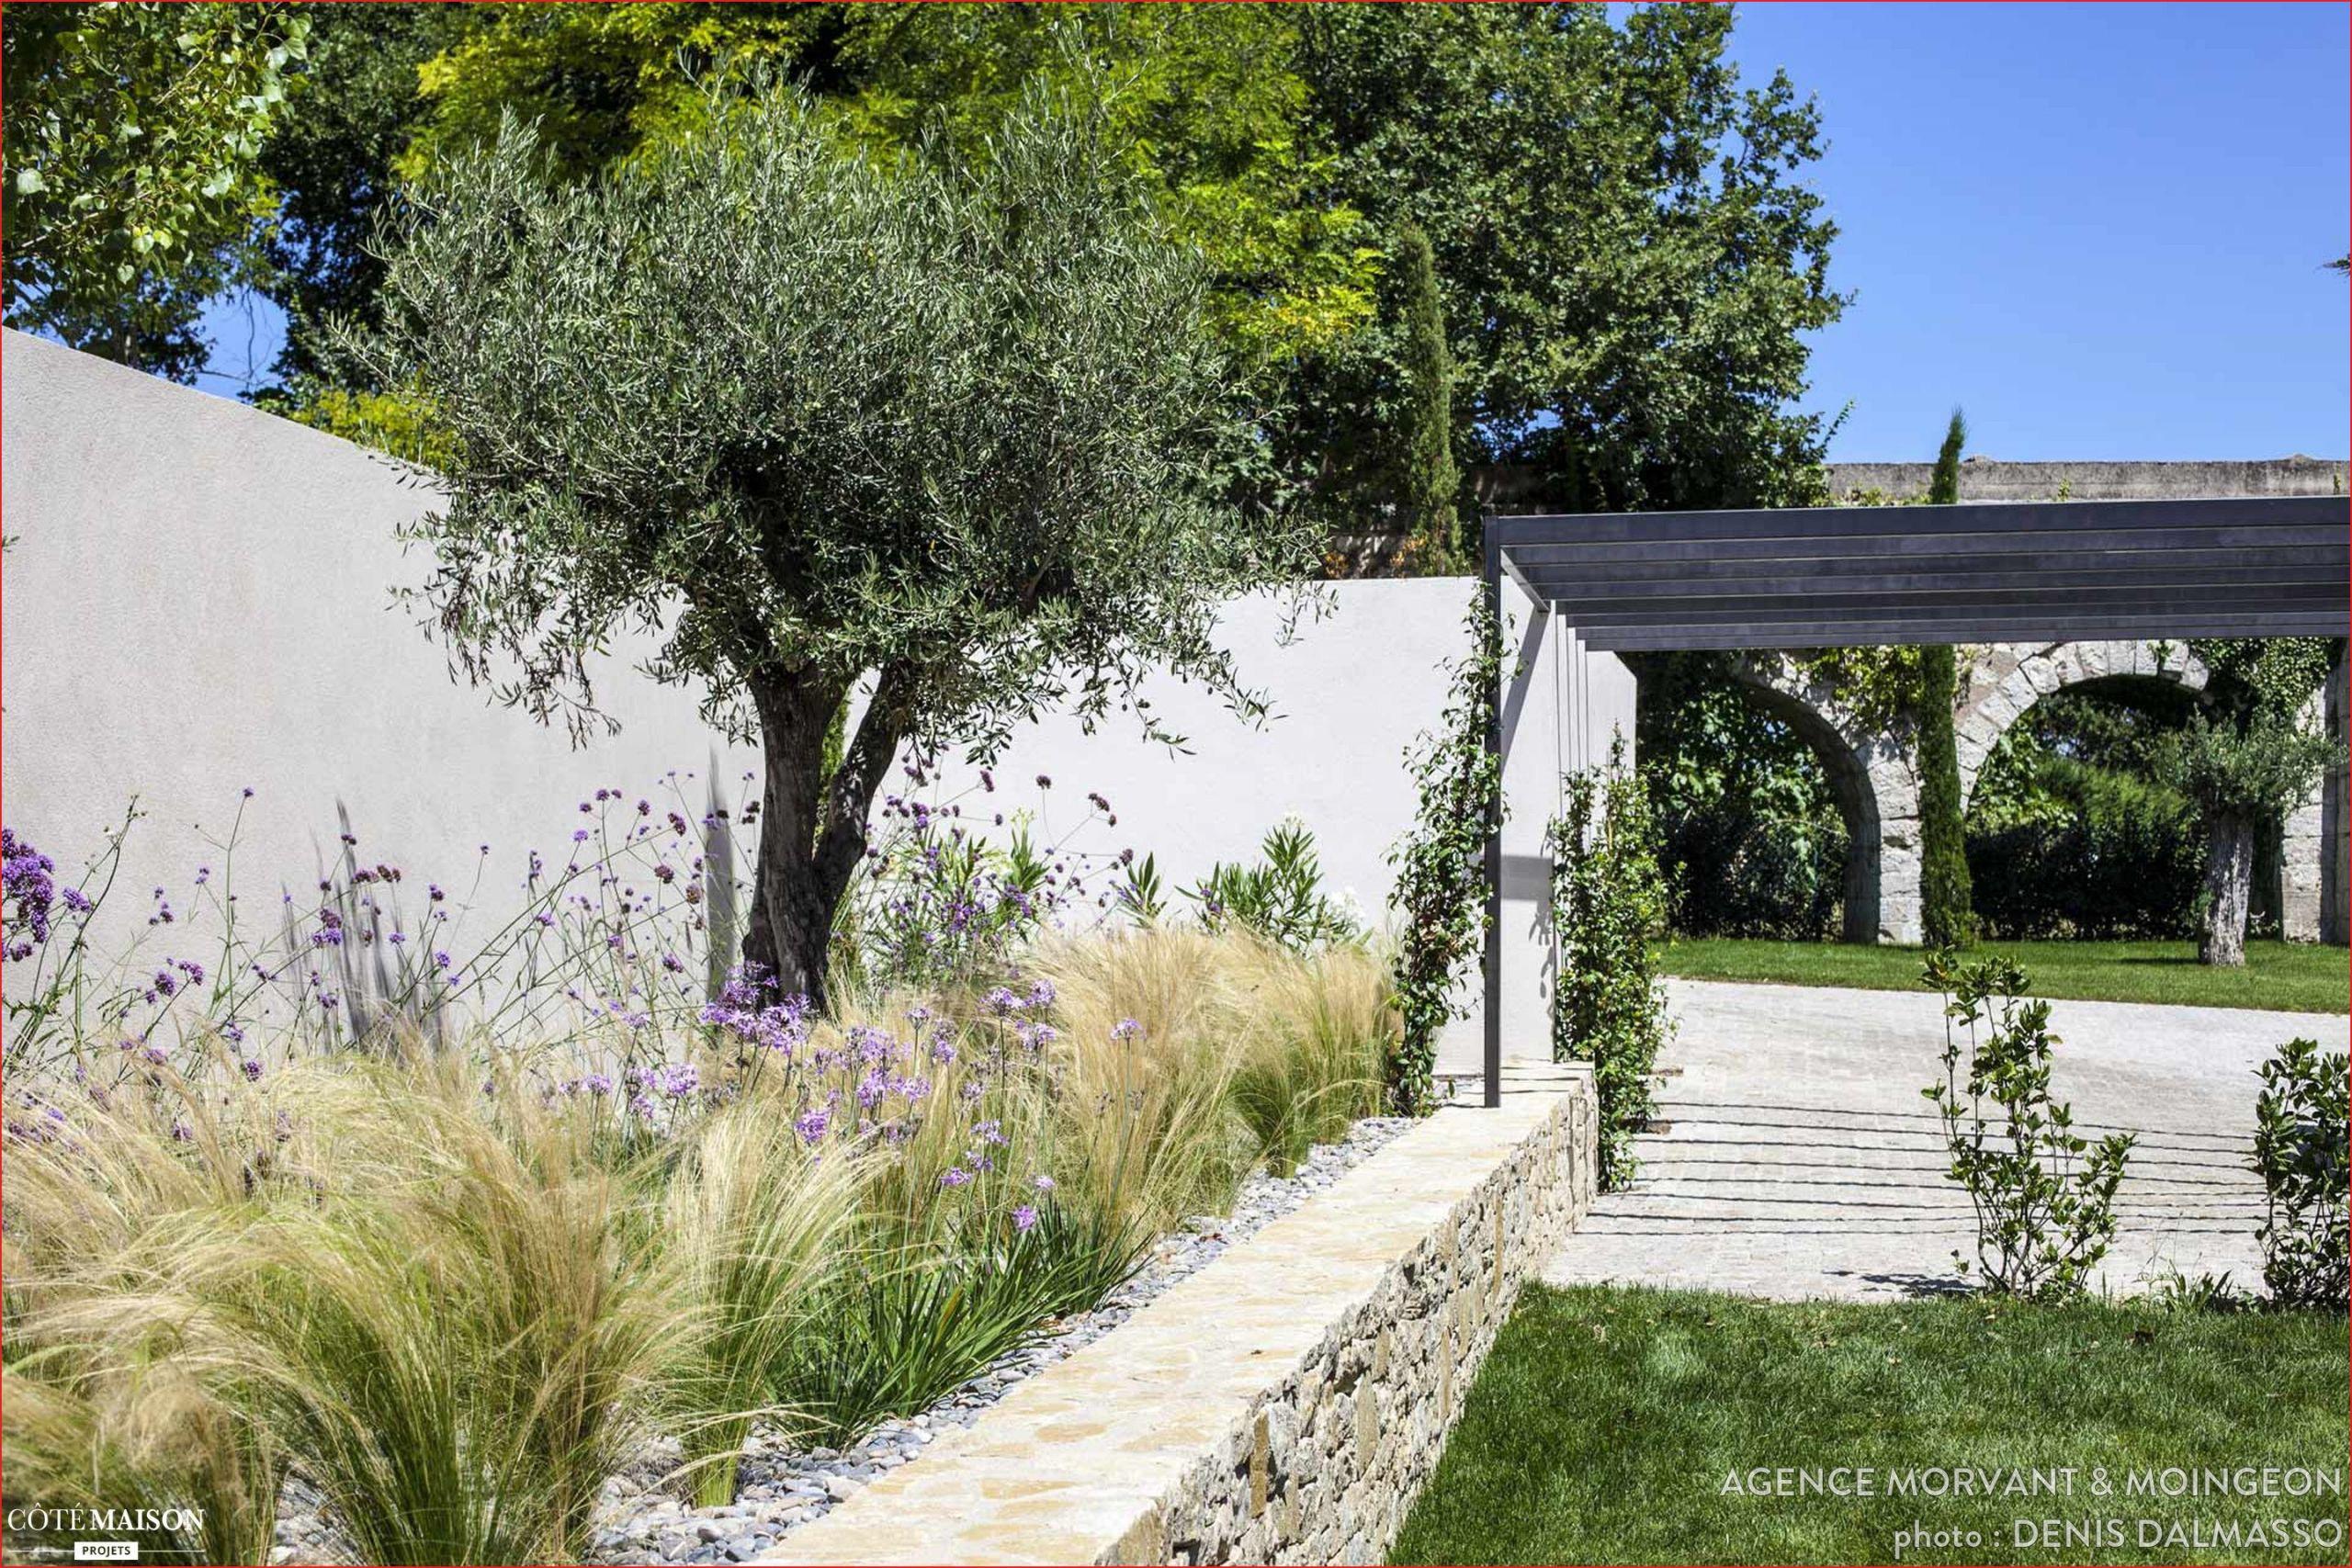 tamis jardin jardin m diterran en contemporain agence morvant moingeon c t of tamis jardin